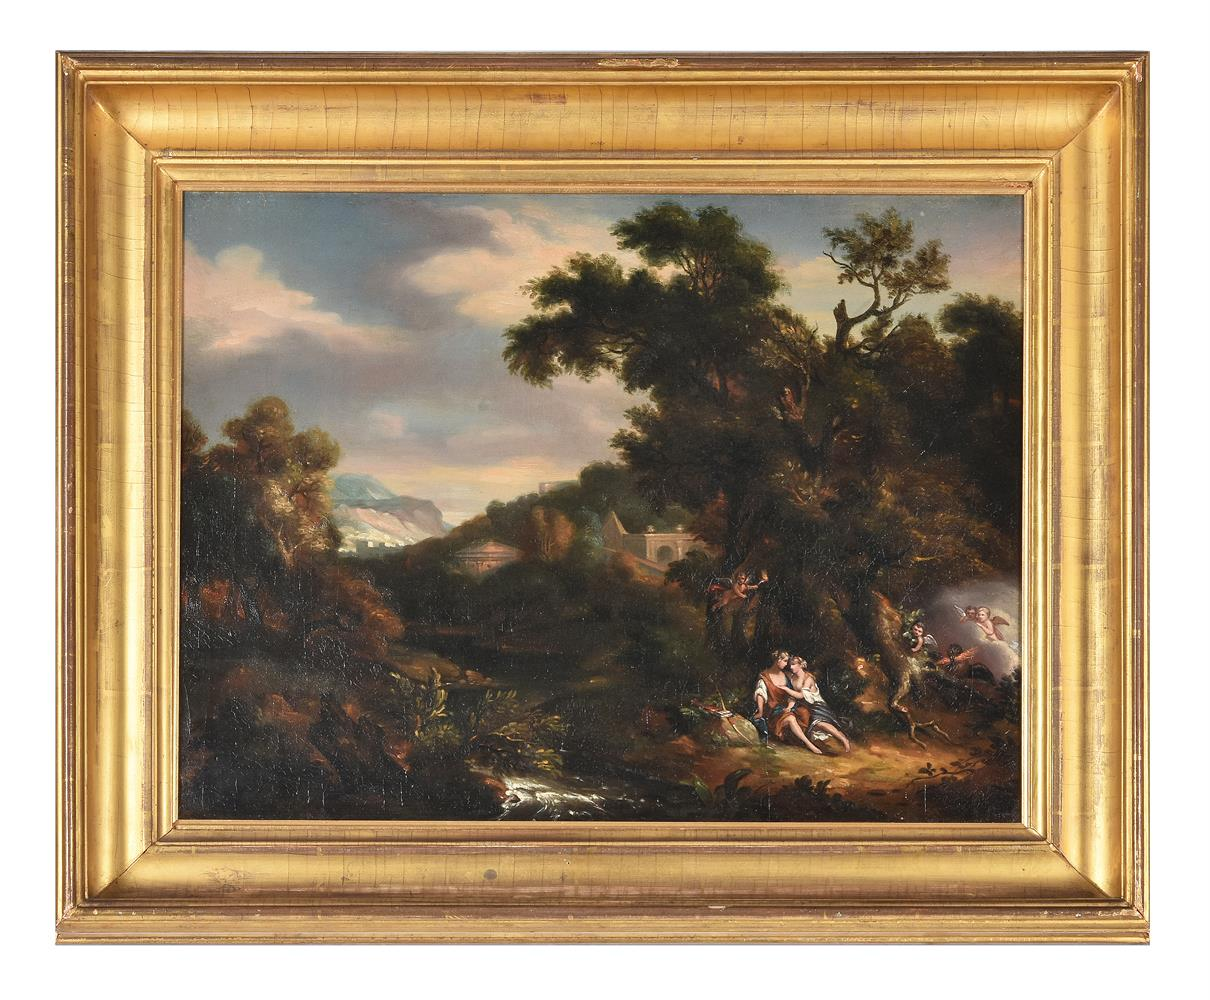 Manner of Claude Lorrain, Figures resting in a landscape